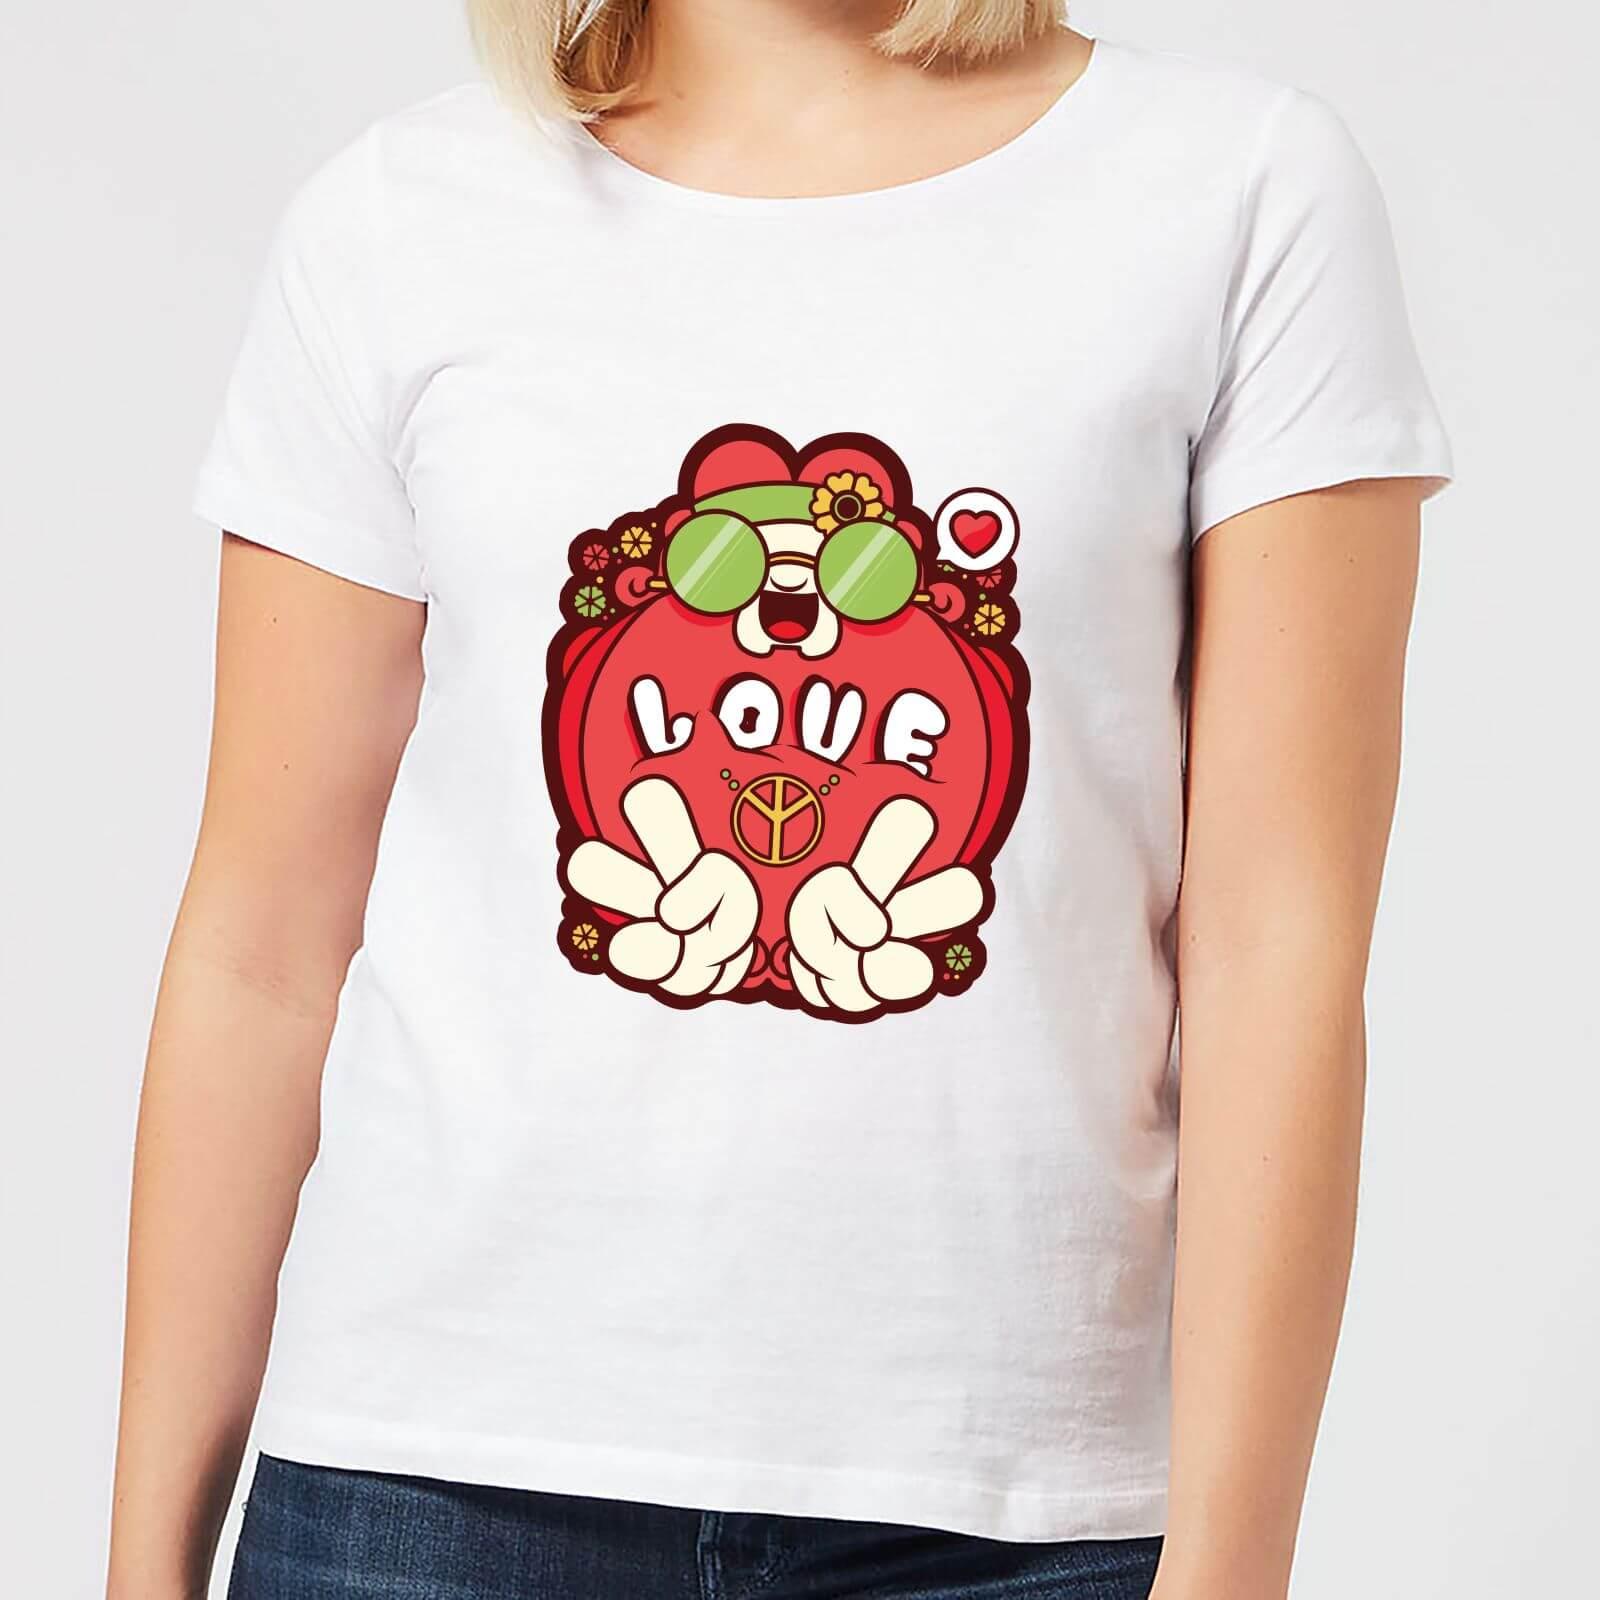 IWOOT Hippie Love Cartoon Women's T-Shirt - White - XXL - White